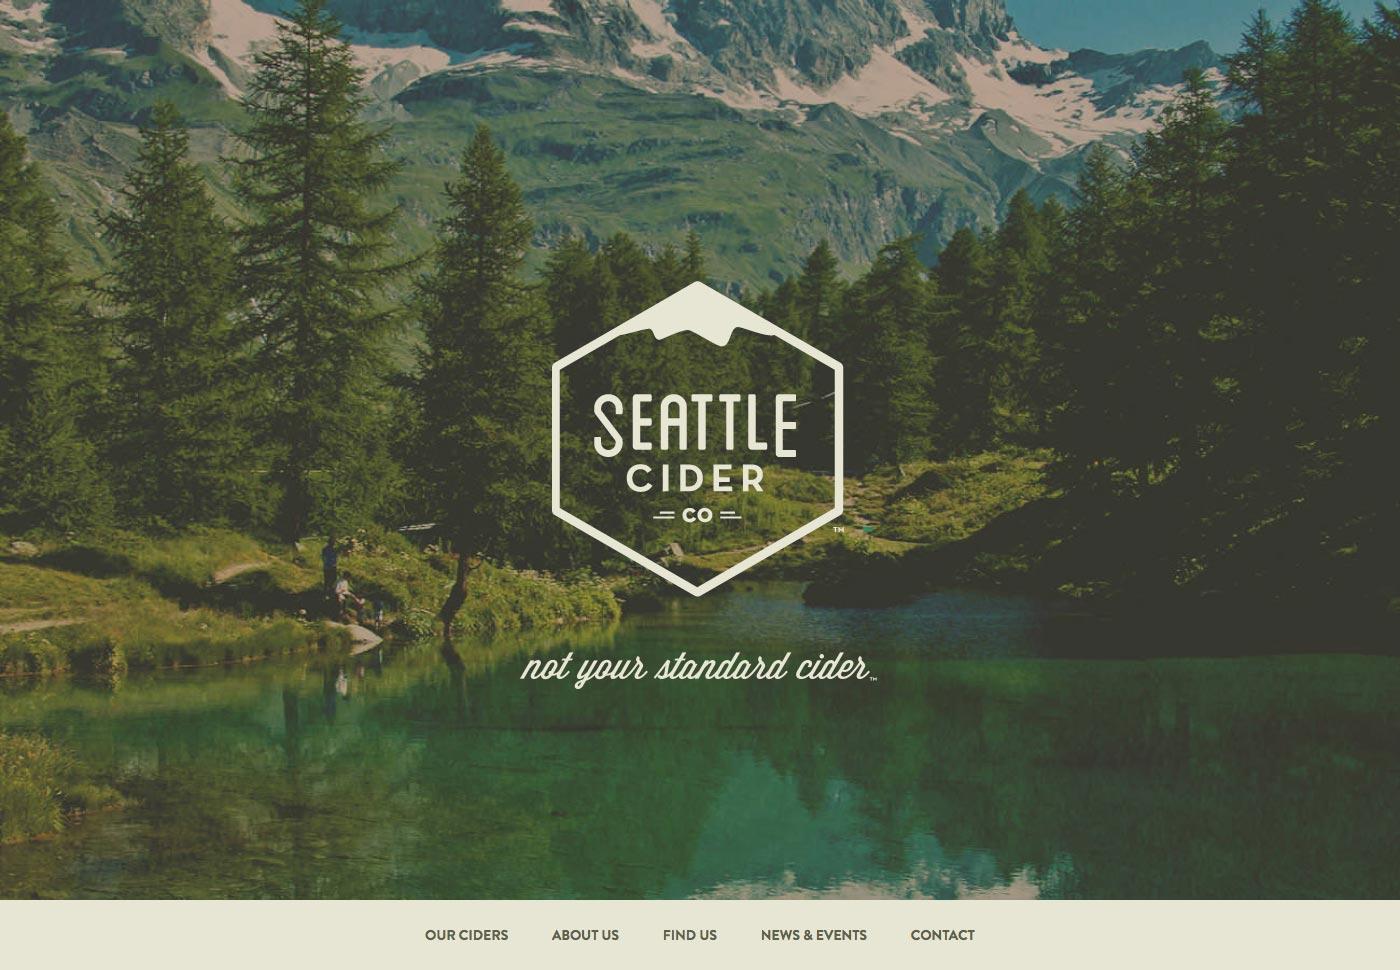 seattle cider